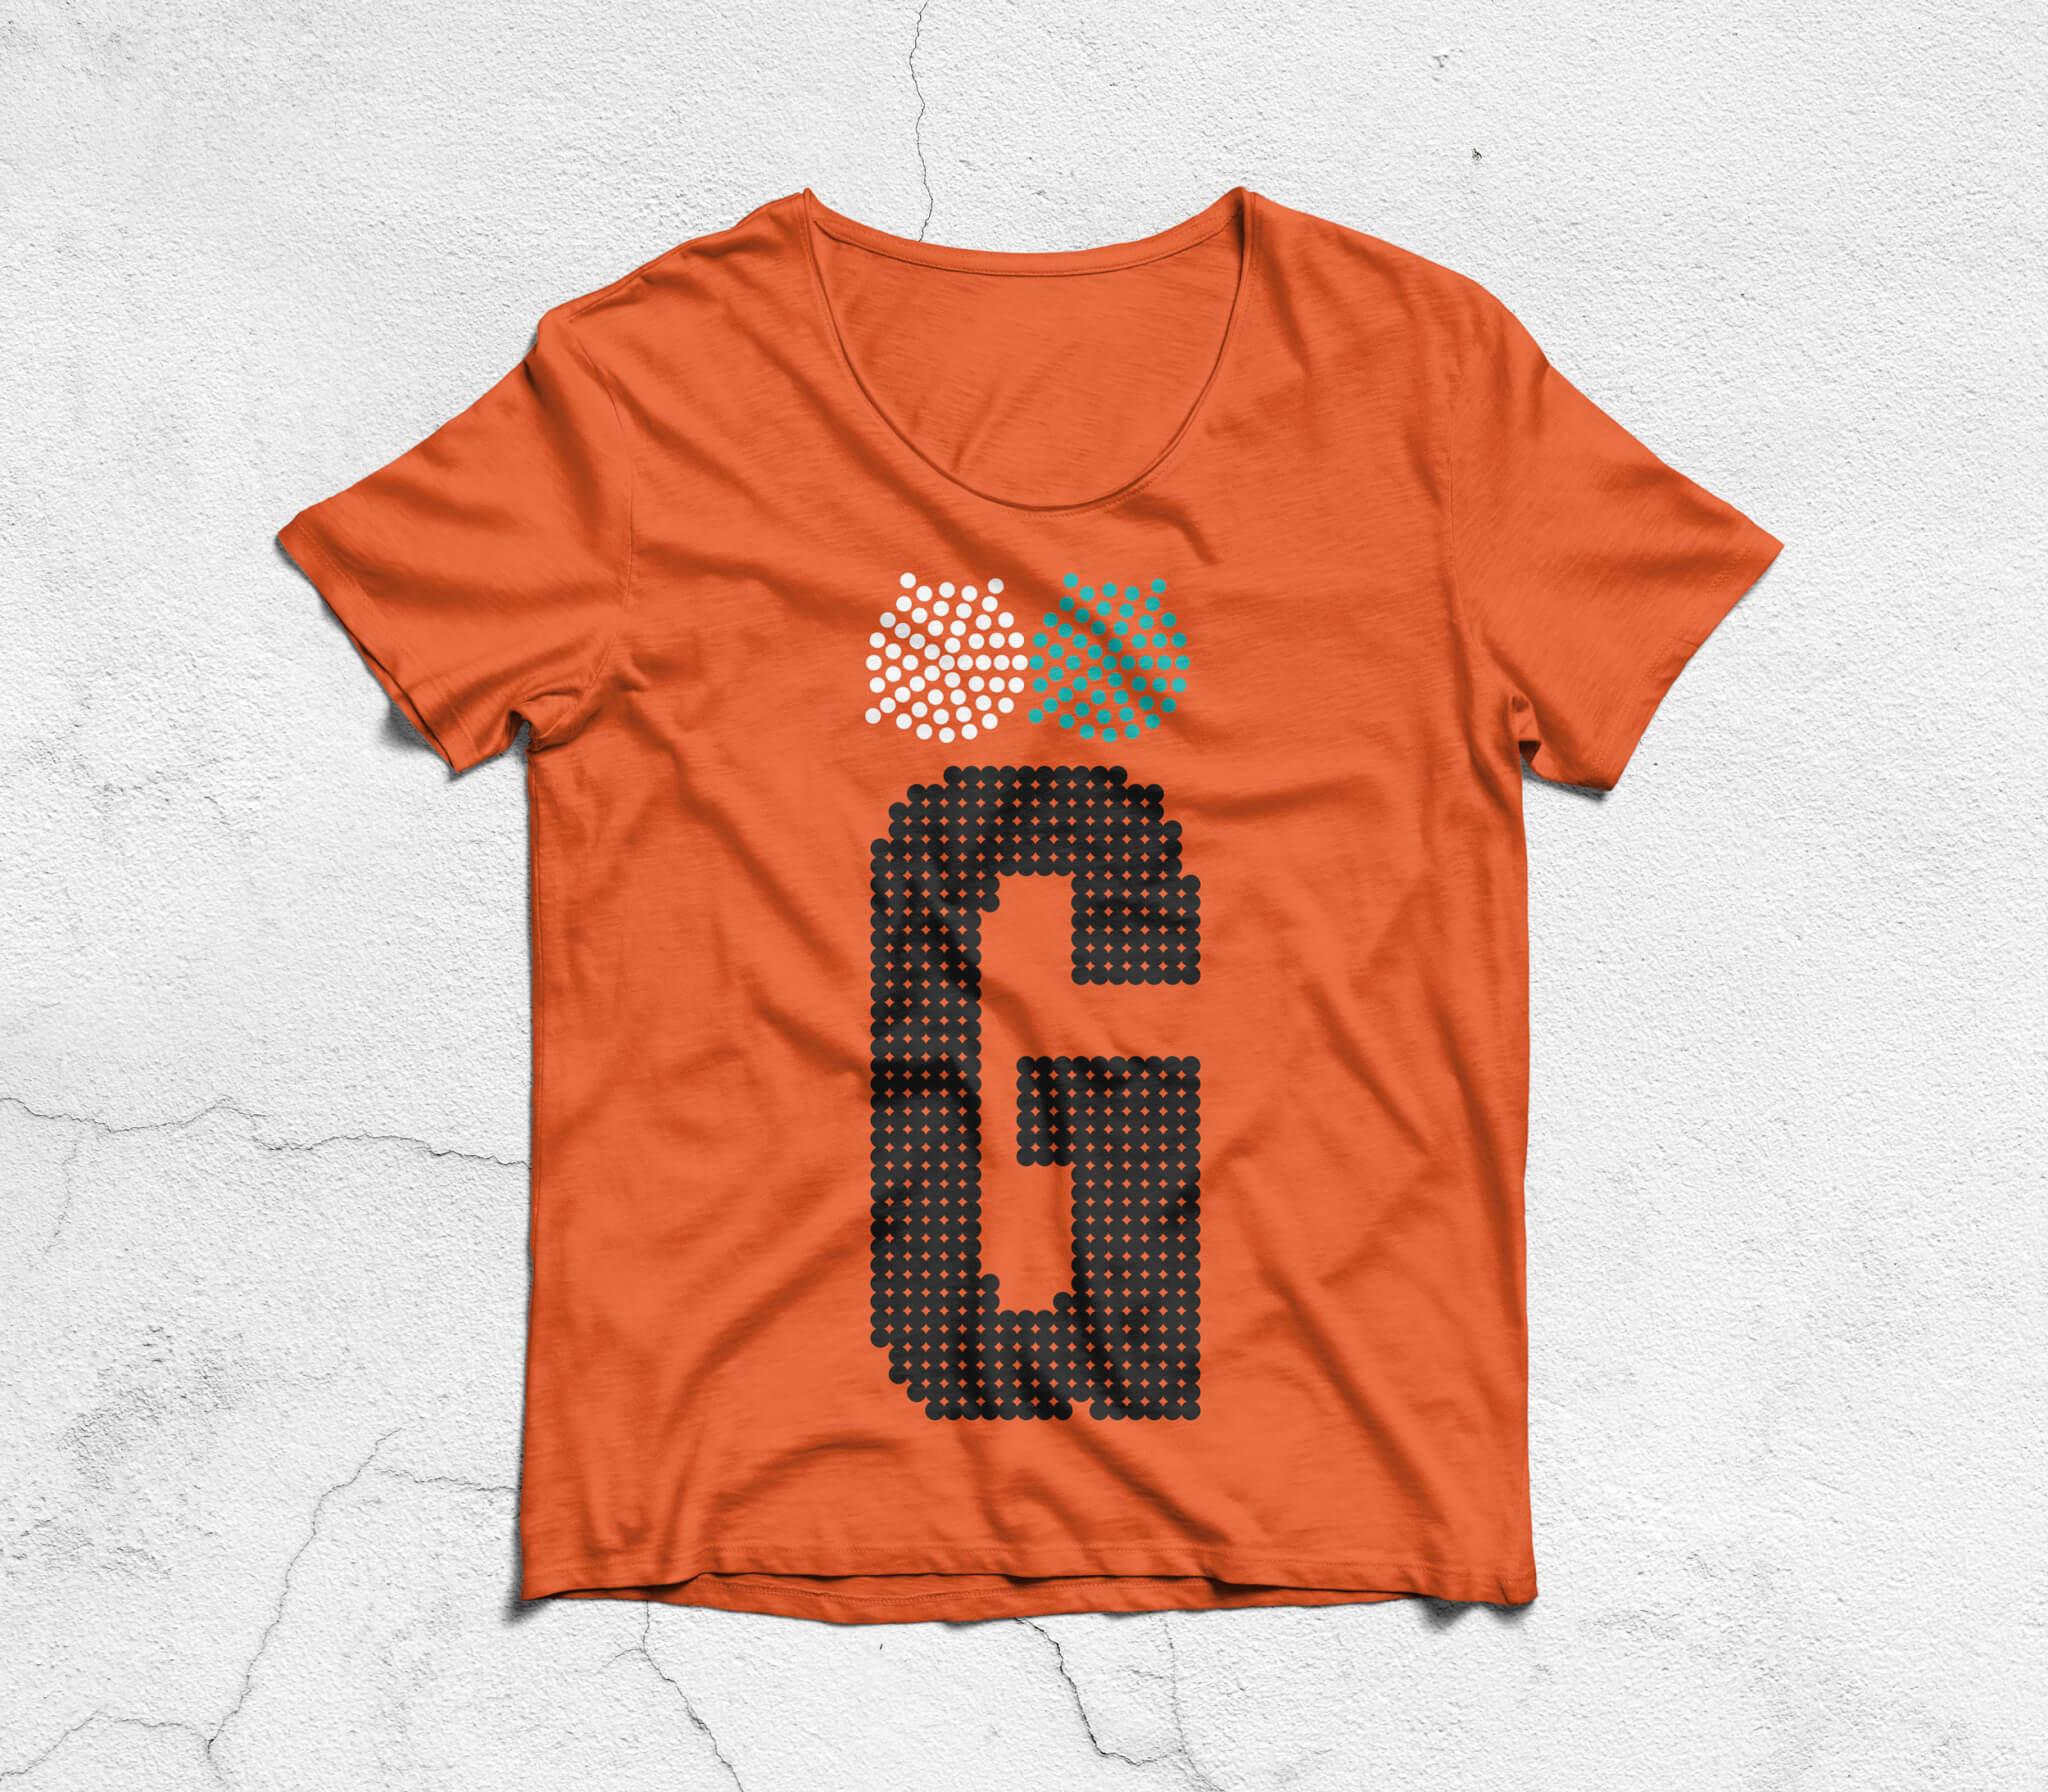 groove-orange-tee-glitch